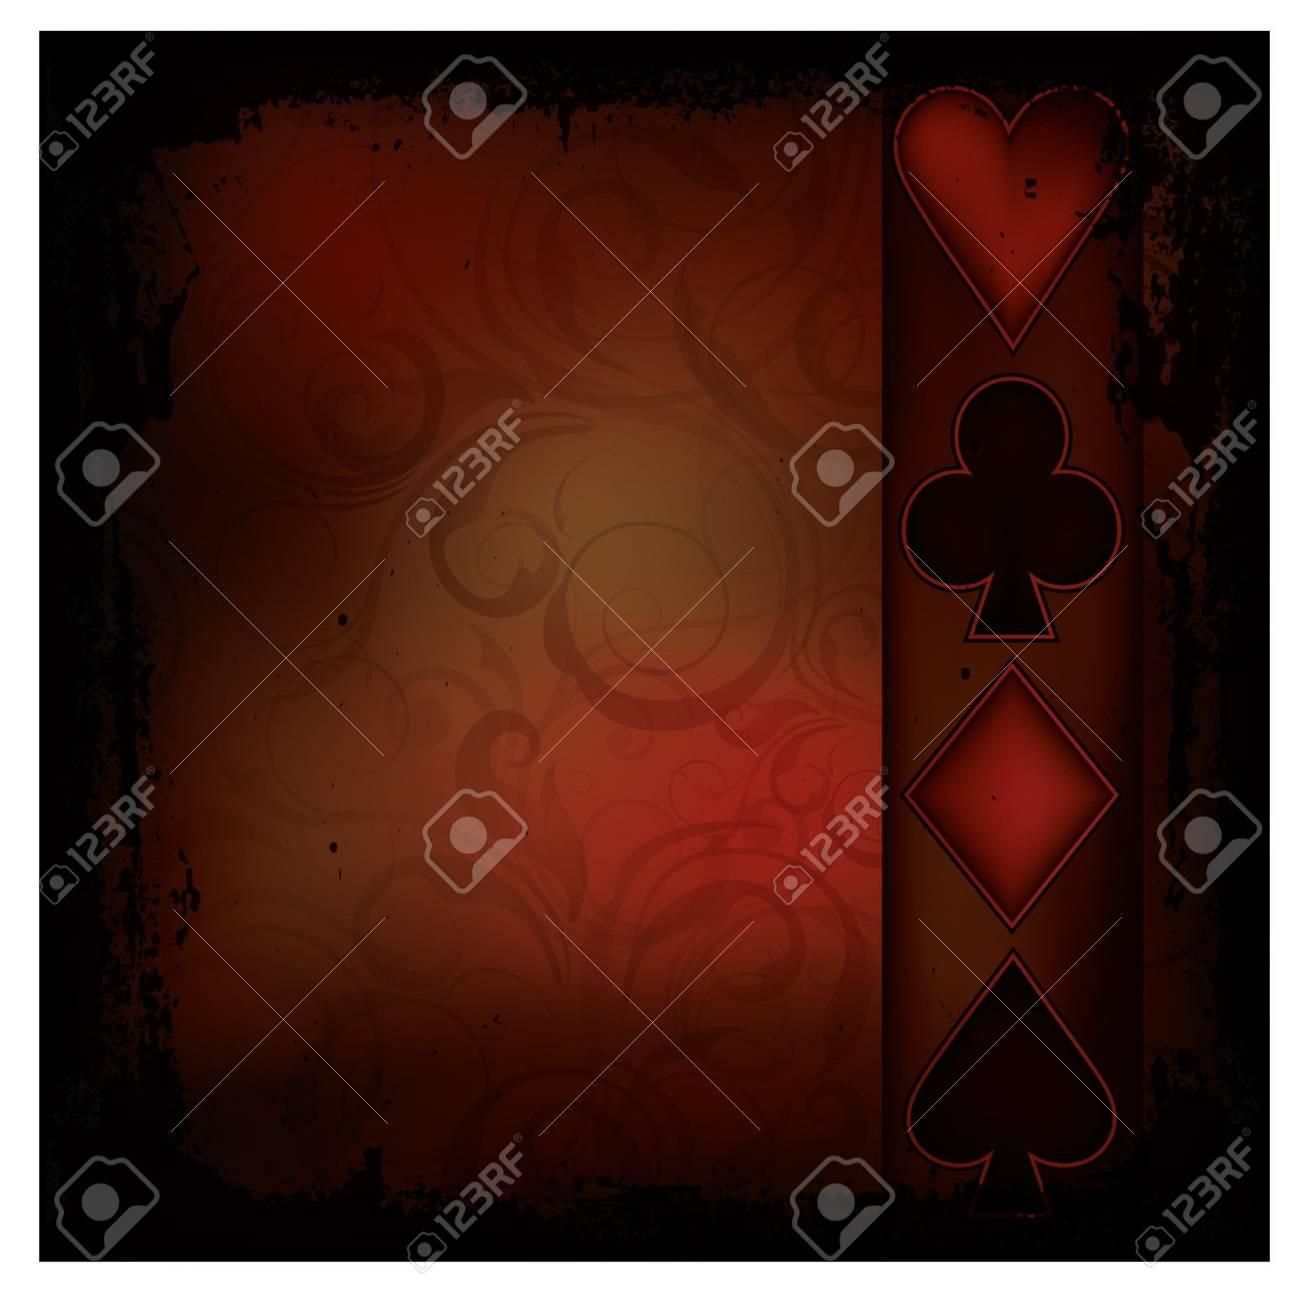 Retro Poker background, vector illustration Stock Vector - 17359205